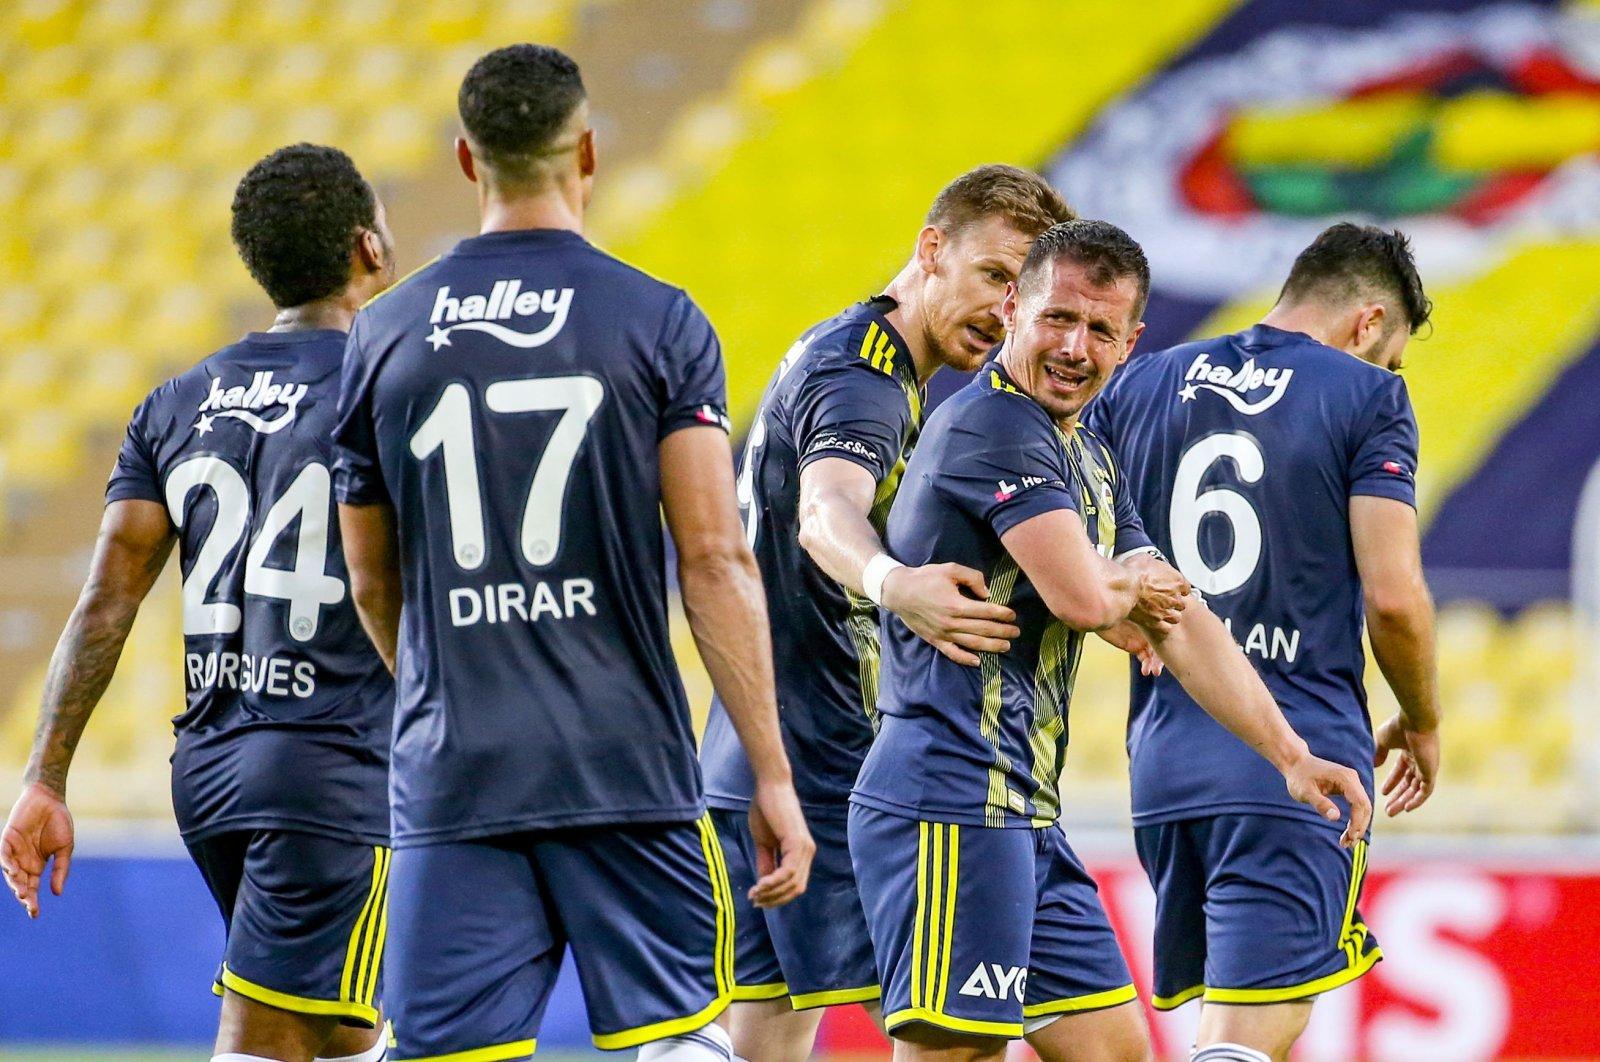 Fenerbahçe's Emre Belözoğlu (2nd R) reacts after a Süper Lig match against Malatayaspor in Istanbul, Turkey, June 27, 2020. (AA Photo)